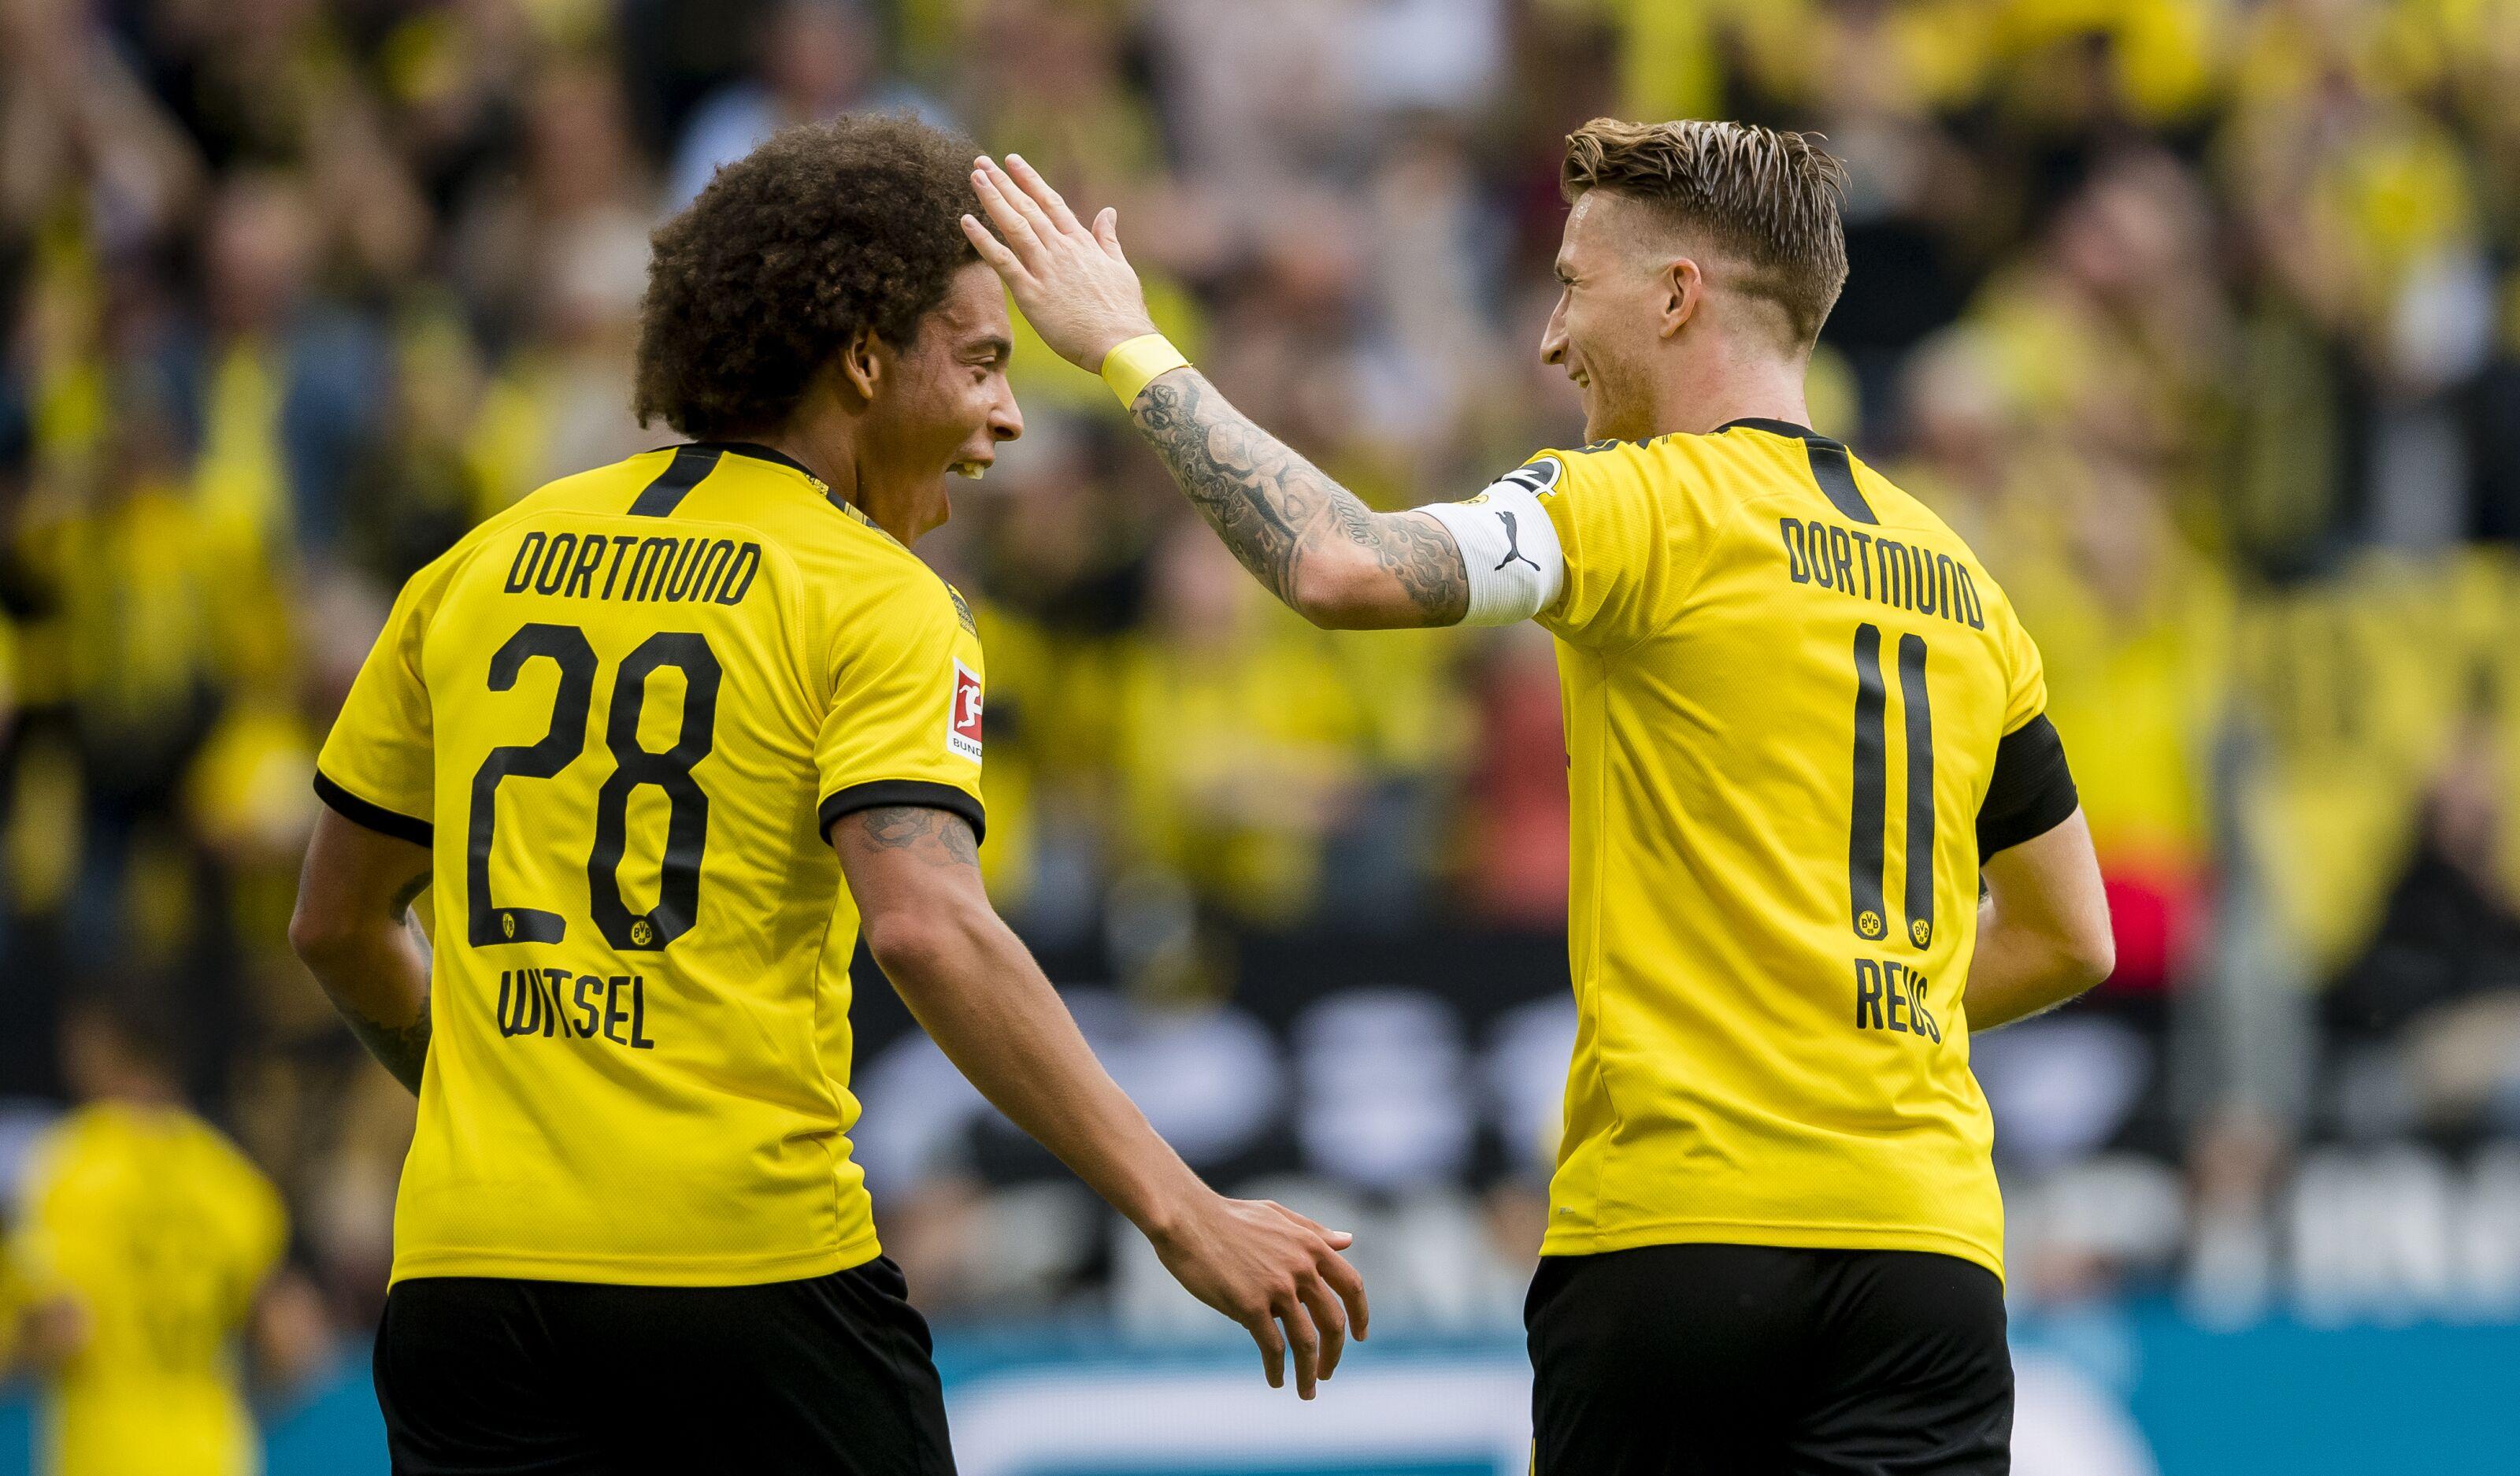 Bundesliga Preview: FC Köln vs Borussia Dortmund